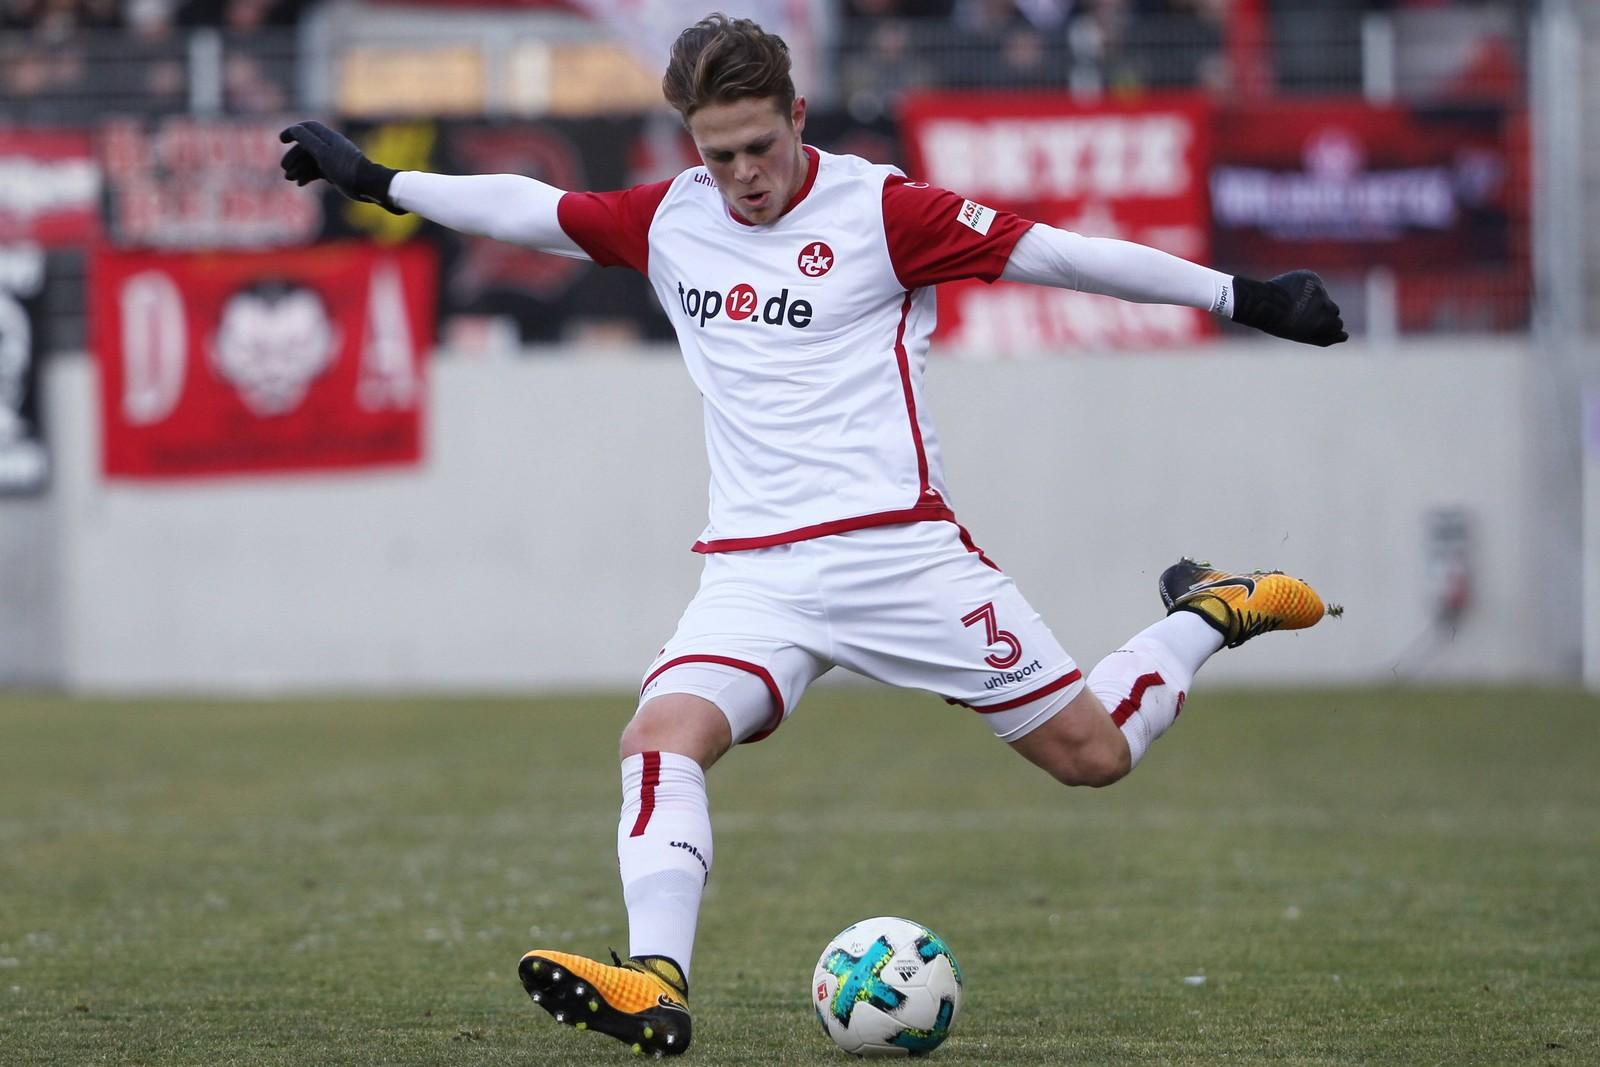 Joel Abu Hanna vom 1. FC Kaiserslautern